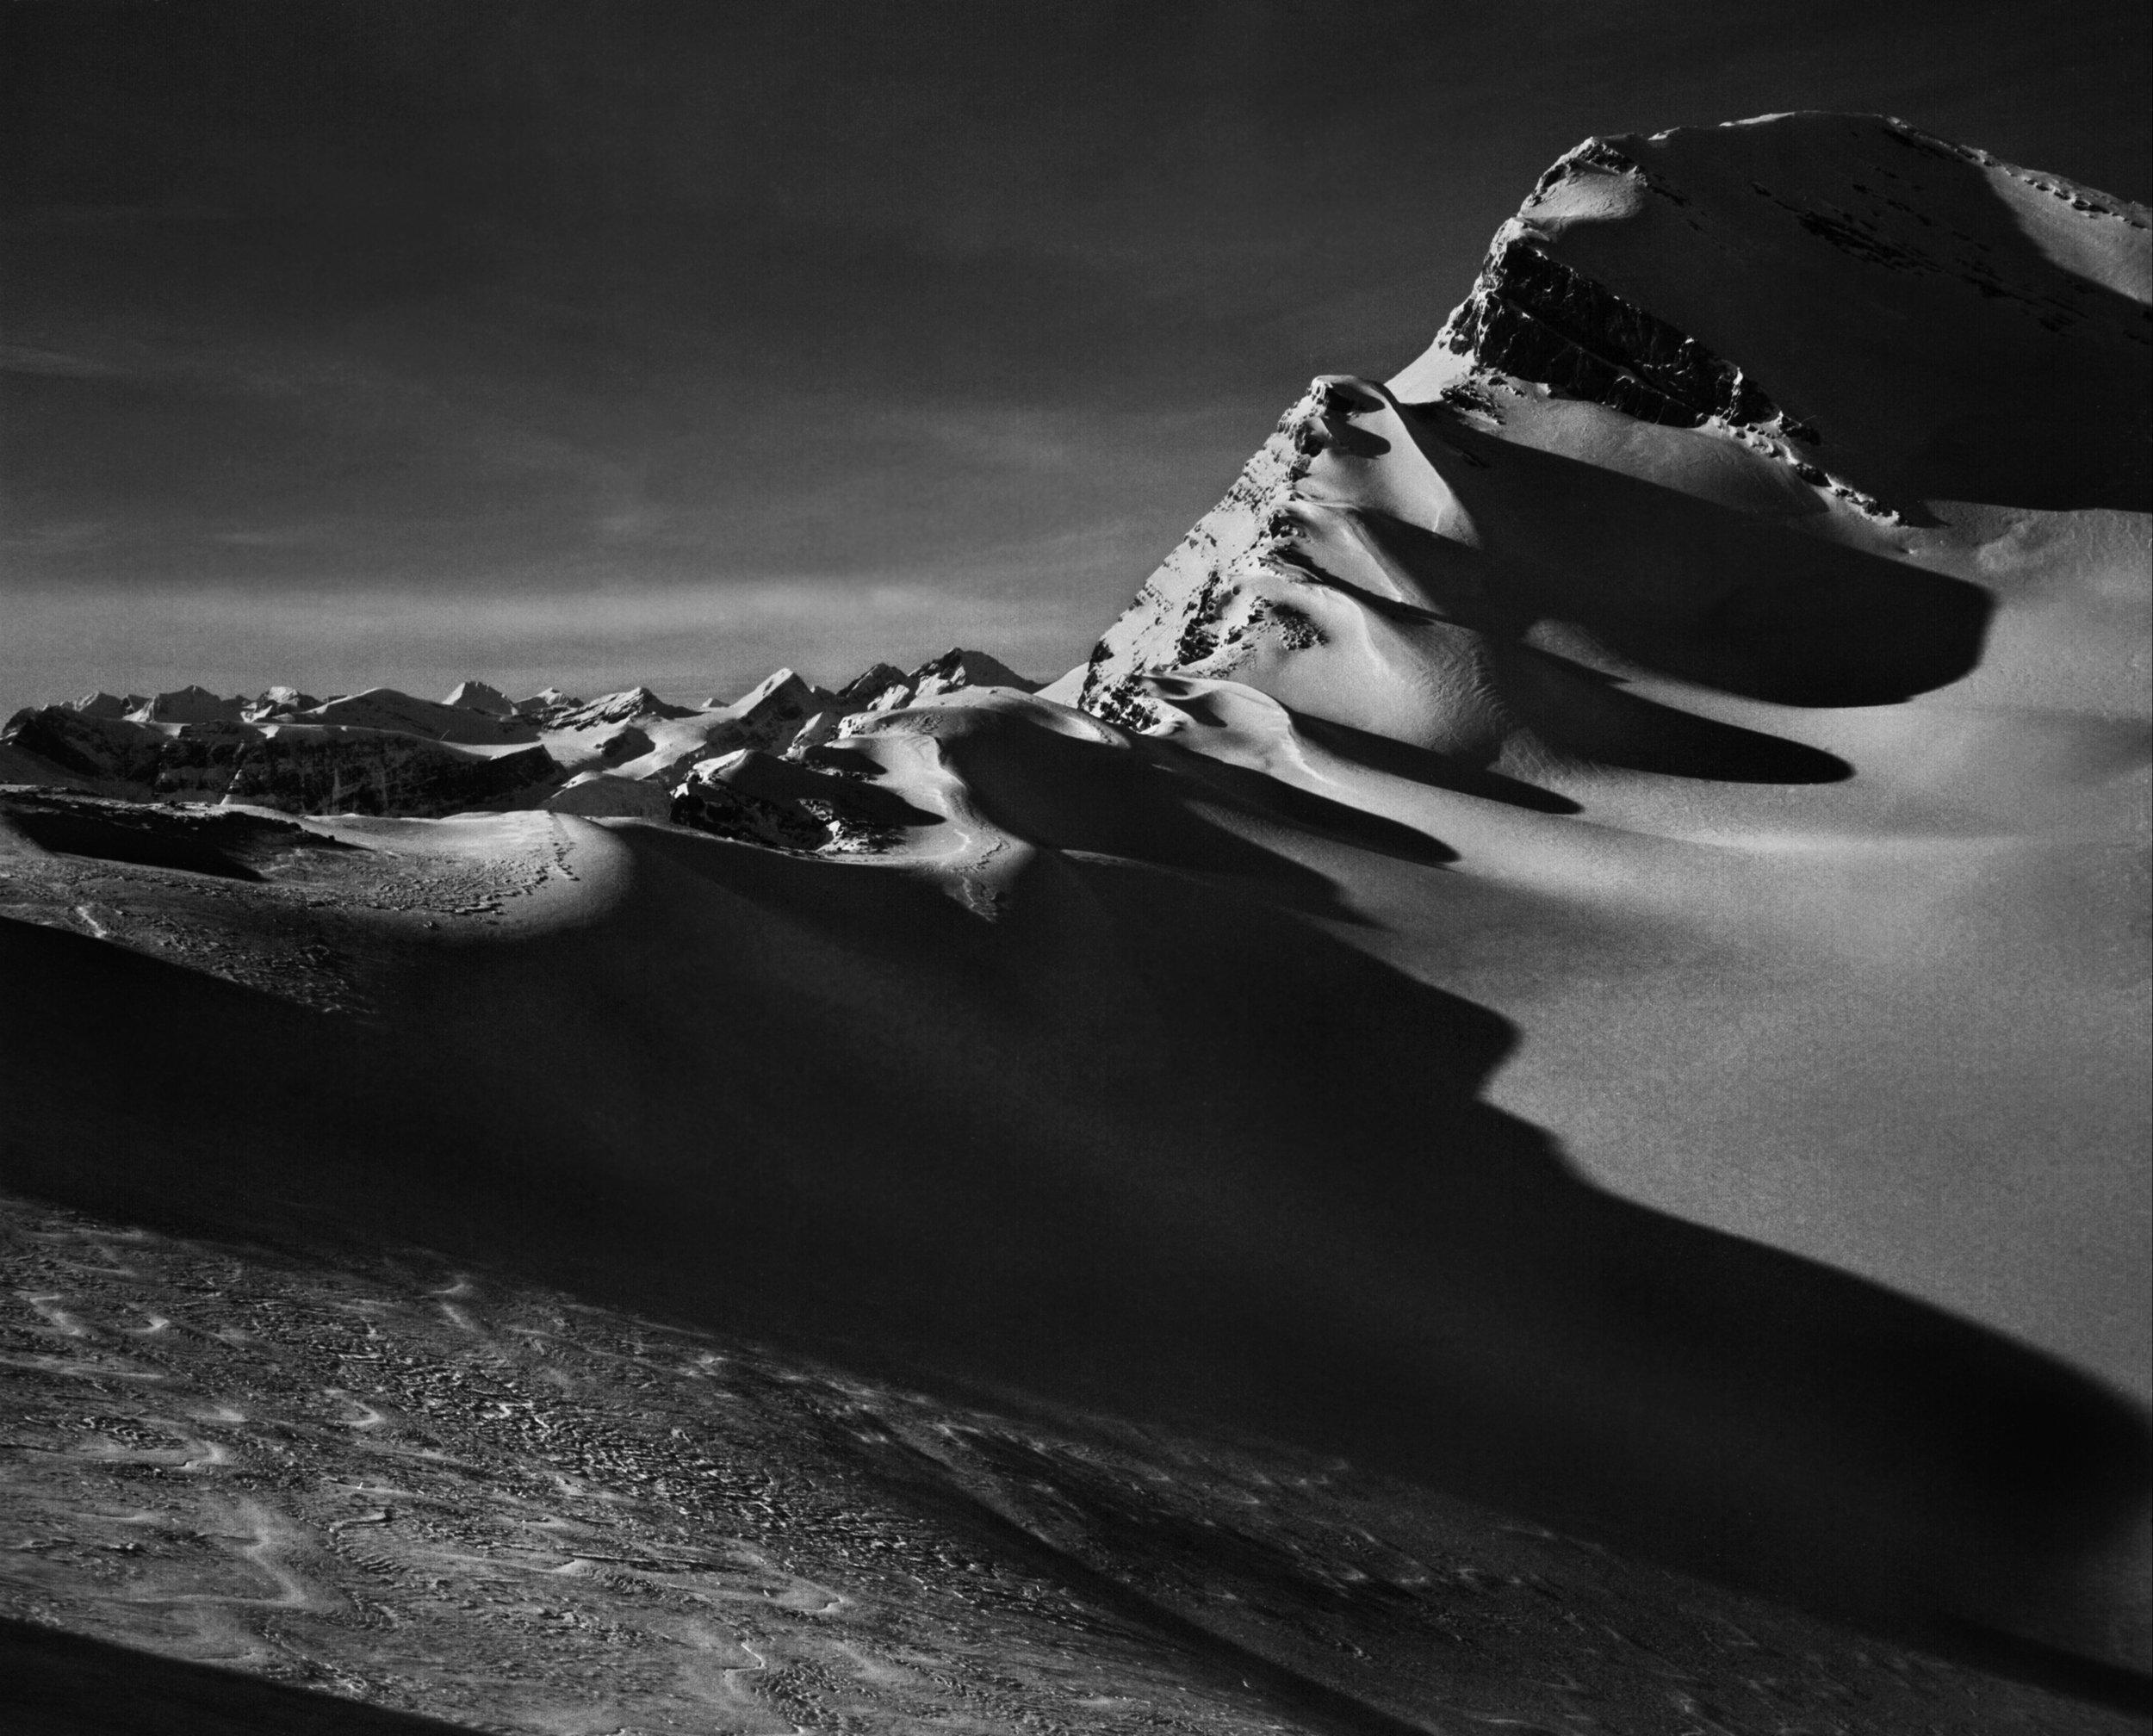 Image:Sebastião Salgado Courtesy The Whyte Museum of the Canadian Rockies